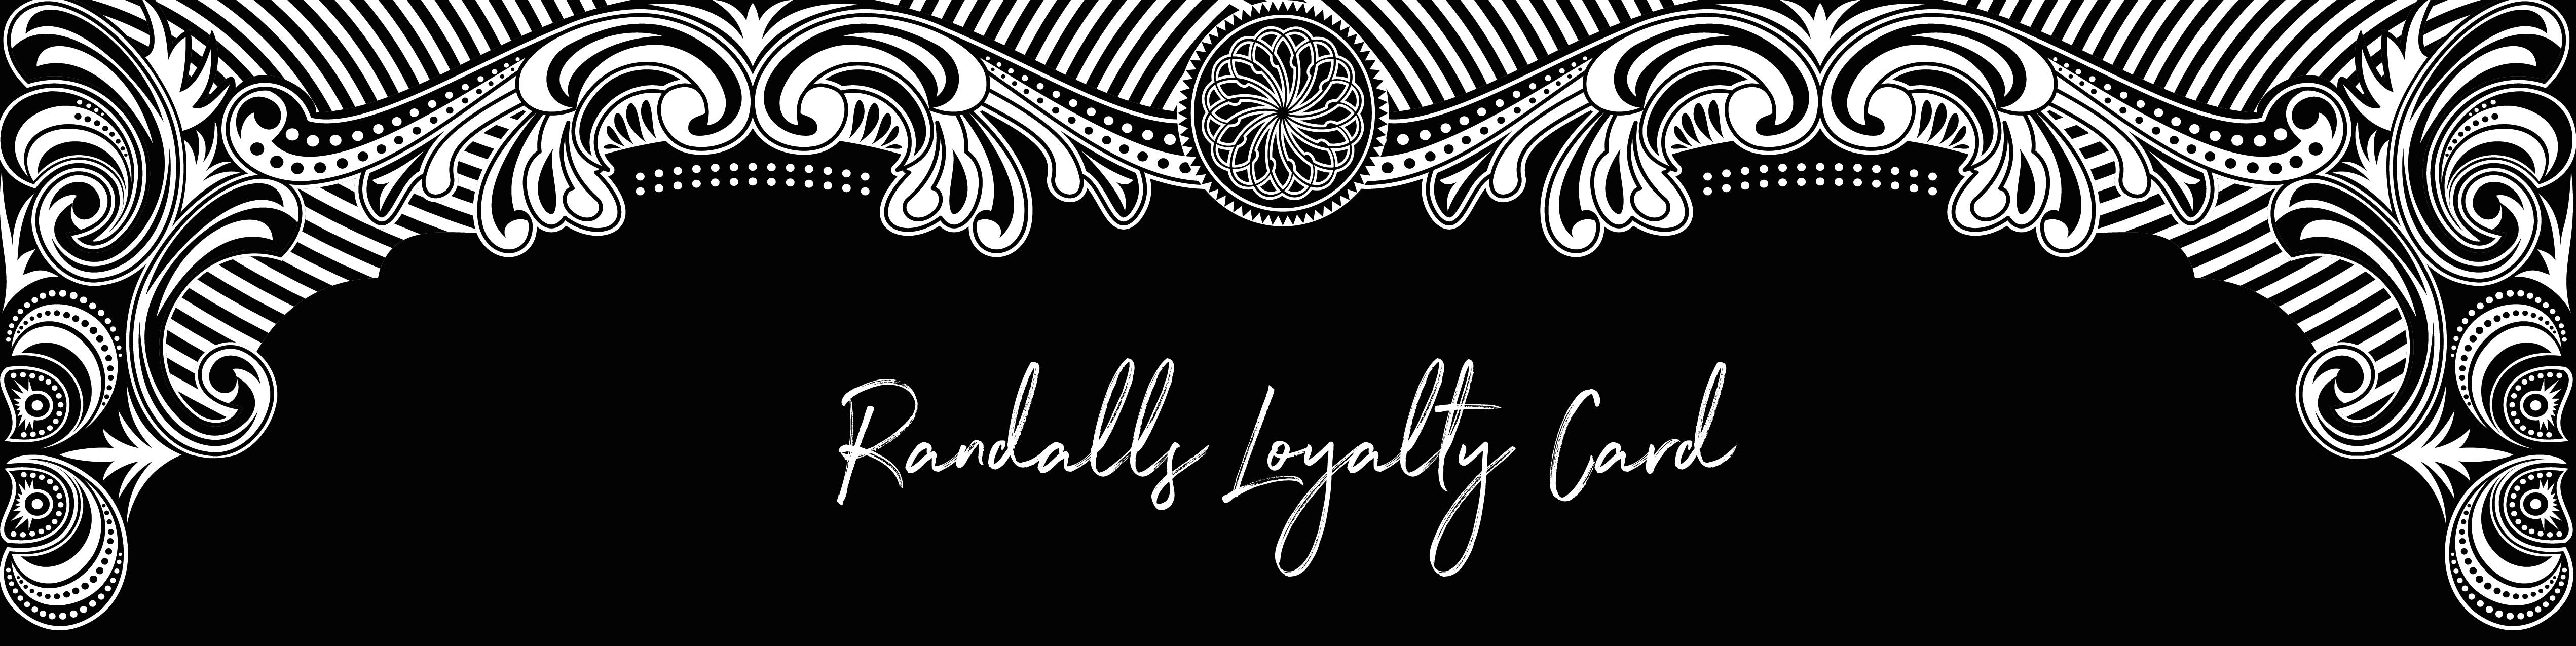 Randalls Loyalty Card